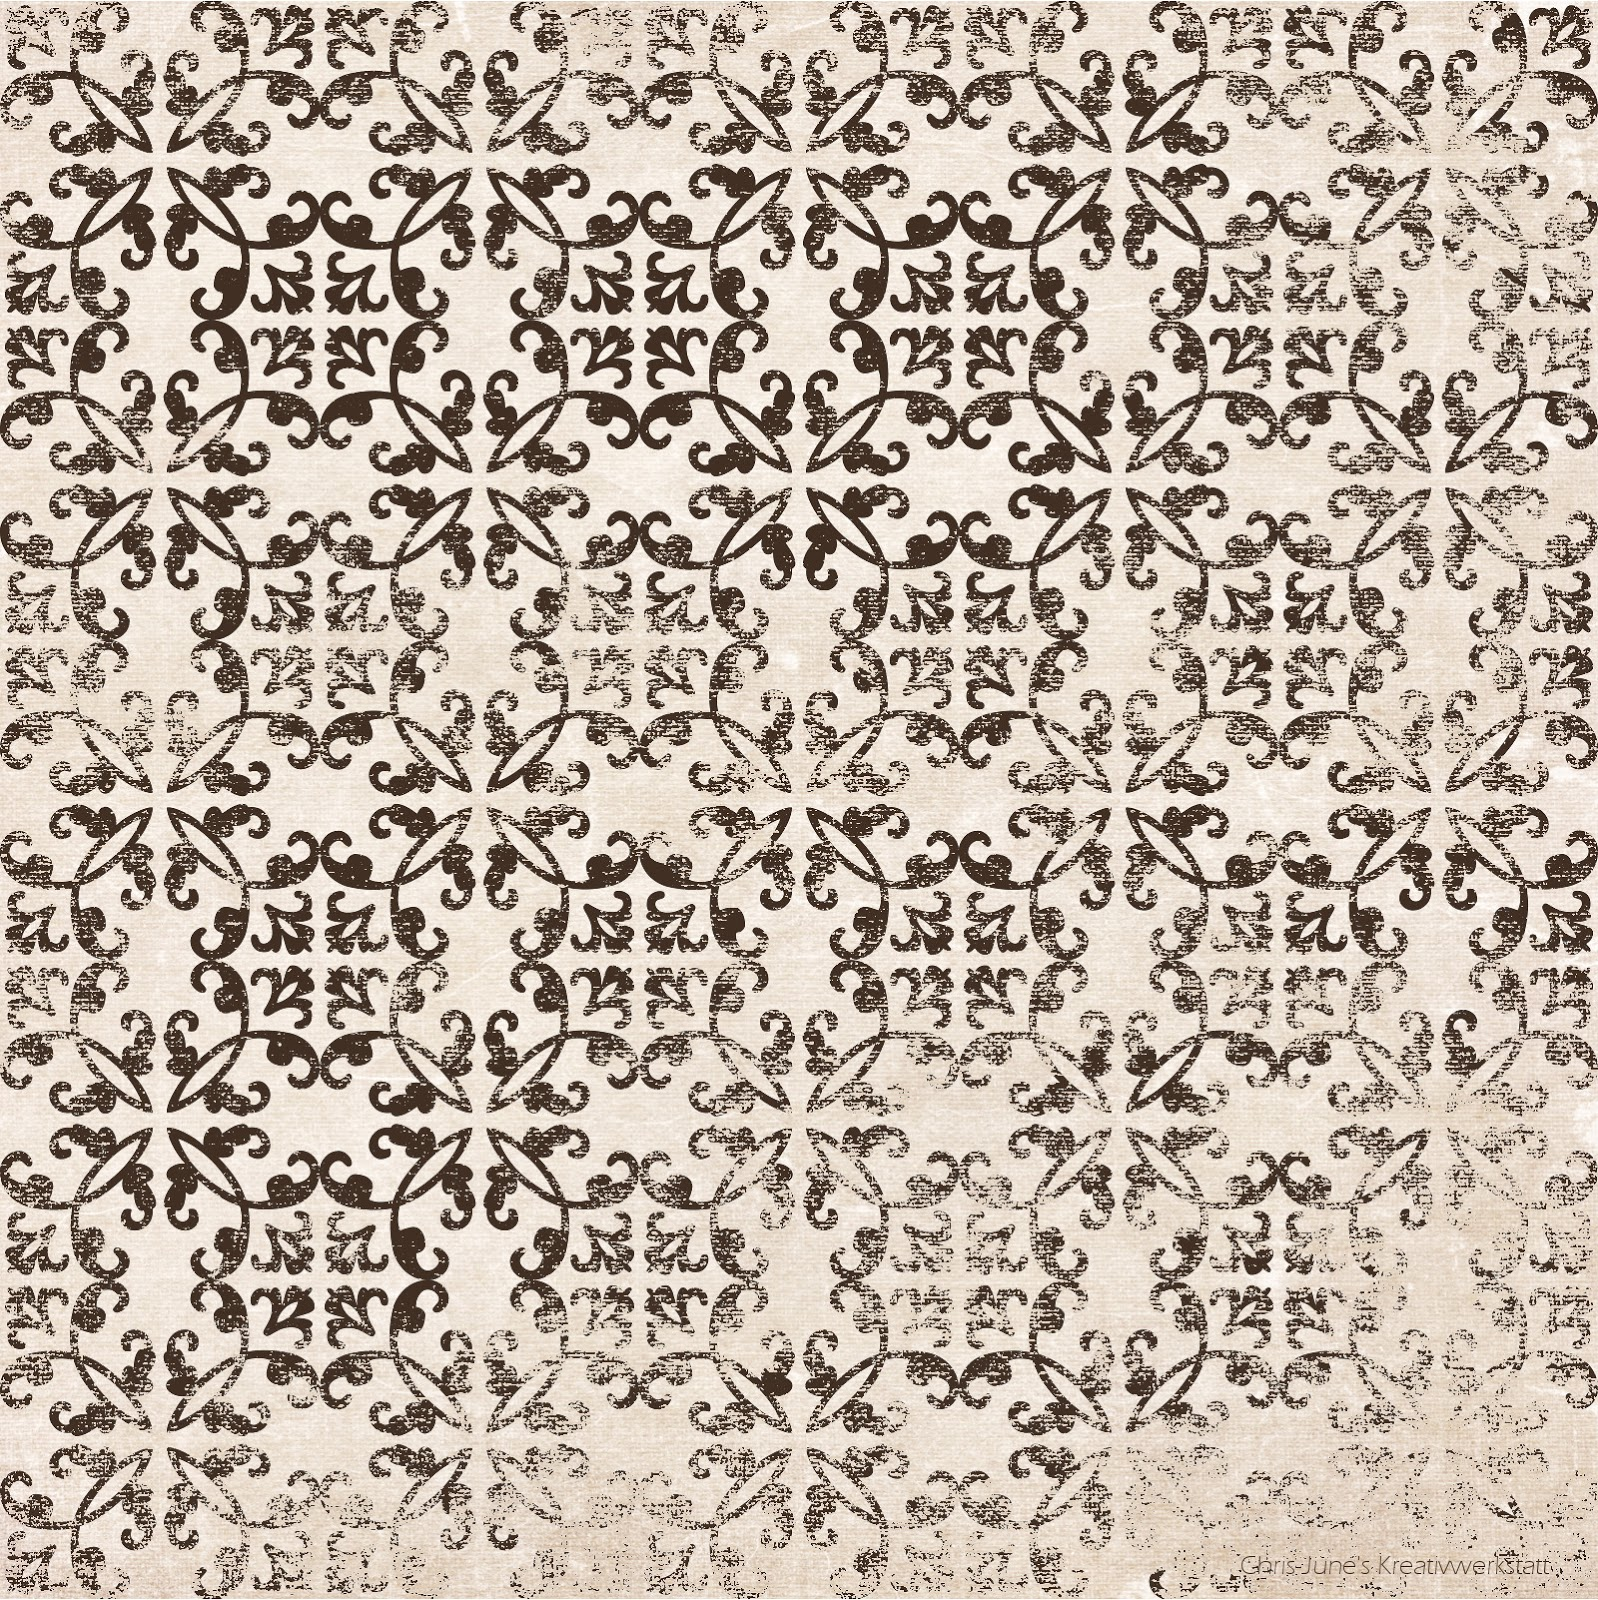 Ornament-Font-Muster, Textur: kk-flow